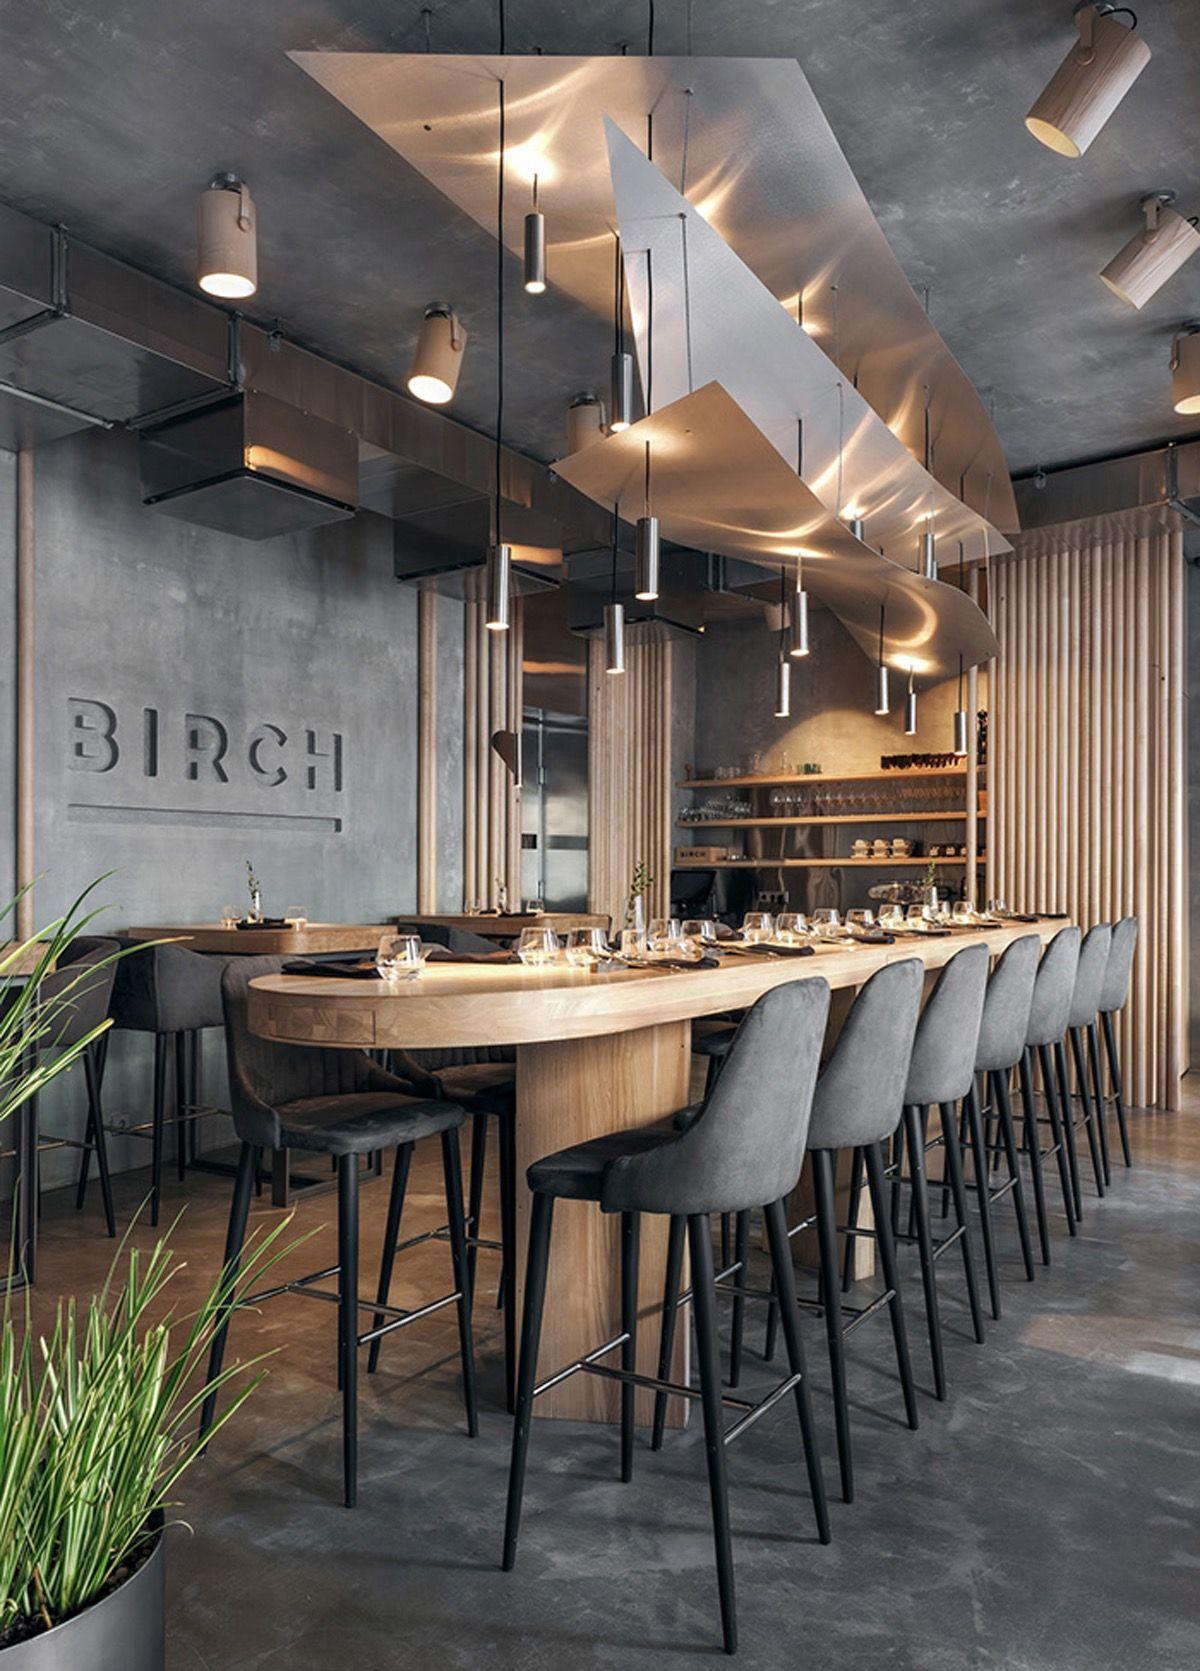 An Inside Look At Birch Restaurant In St Petersburg